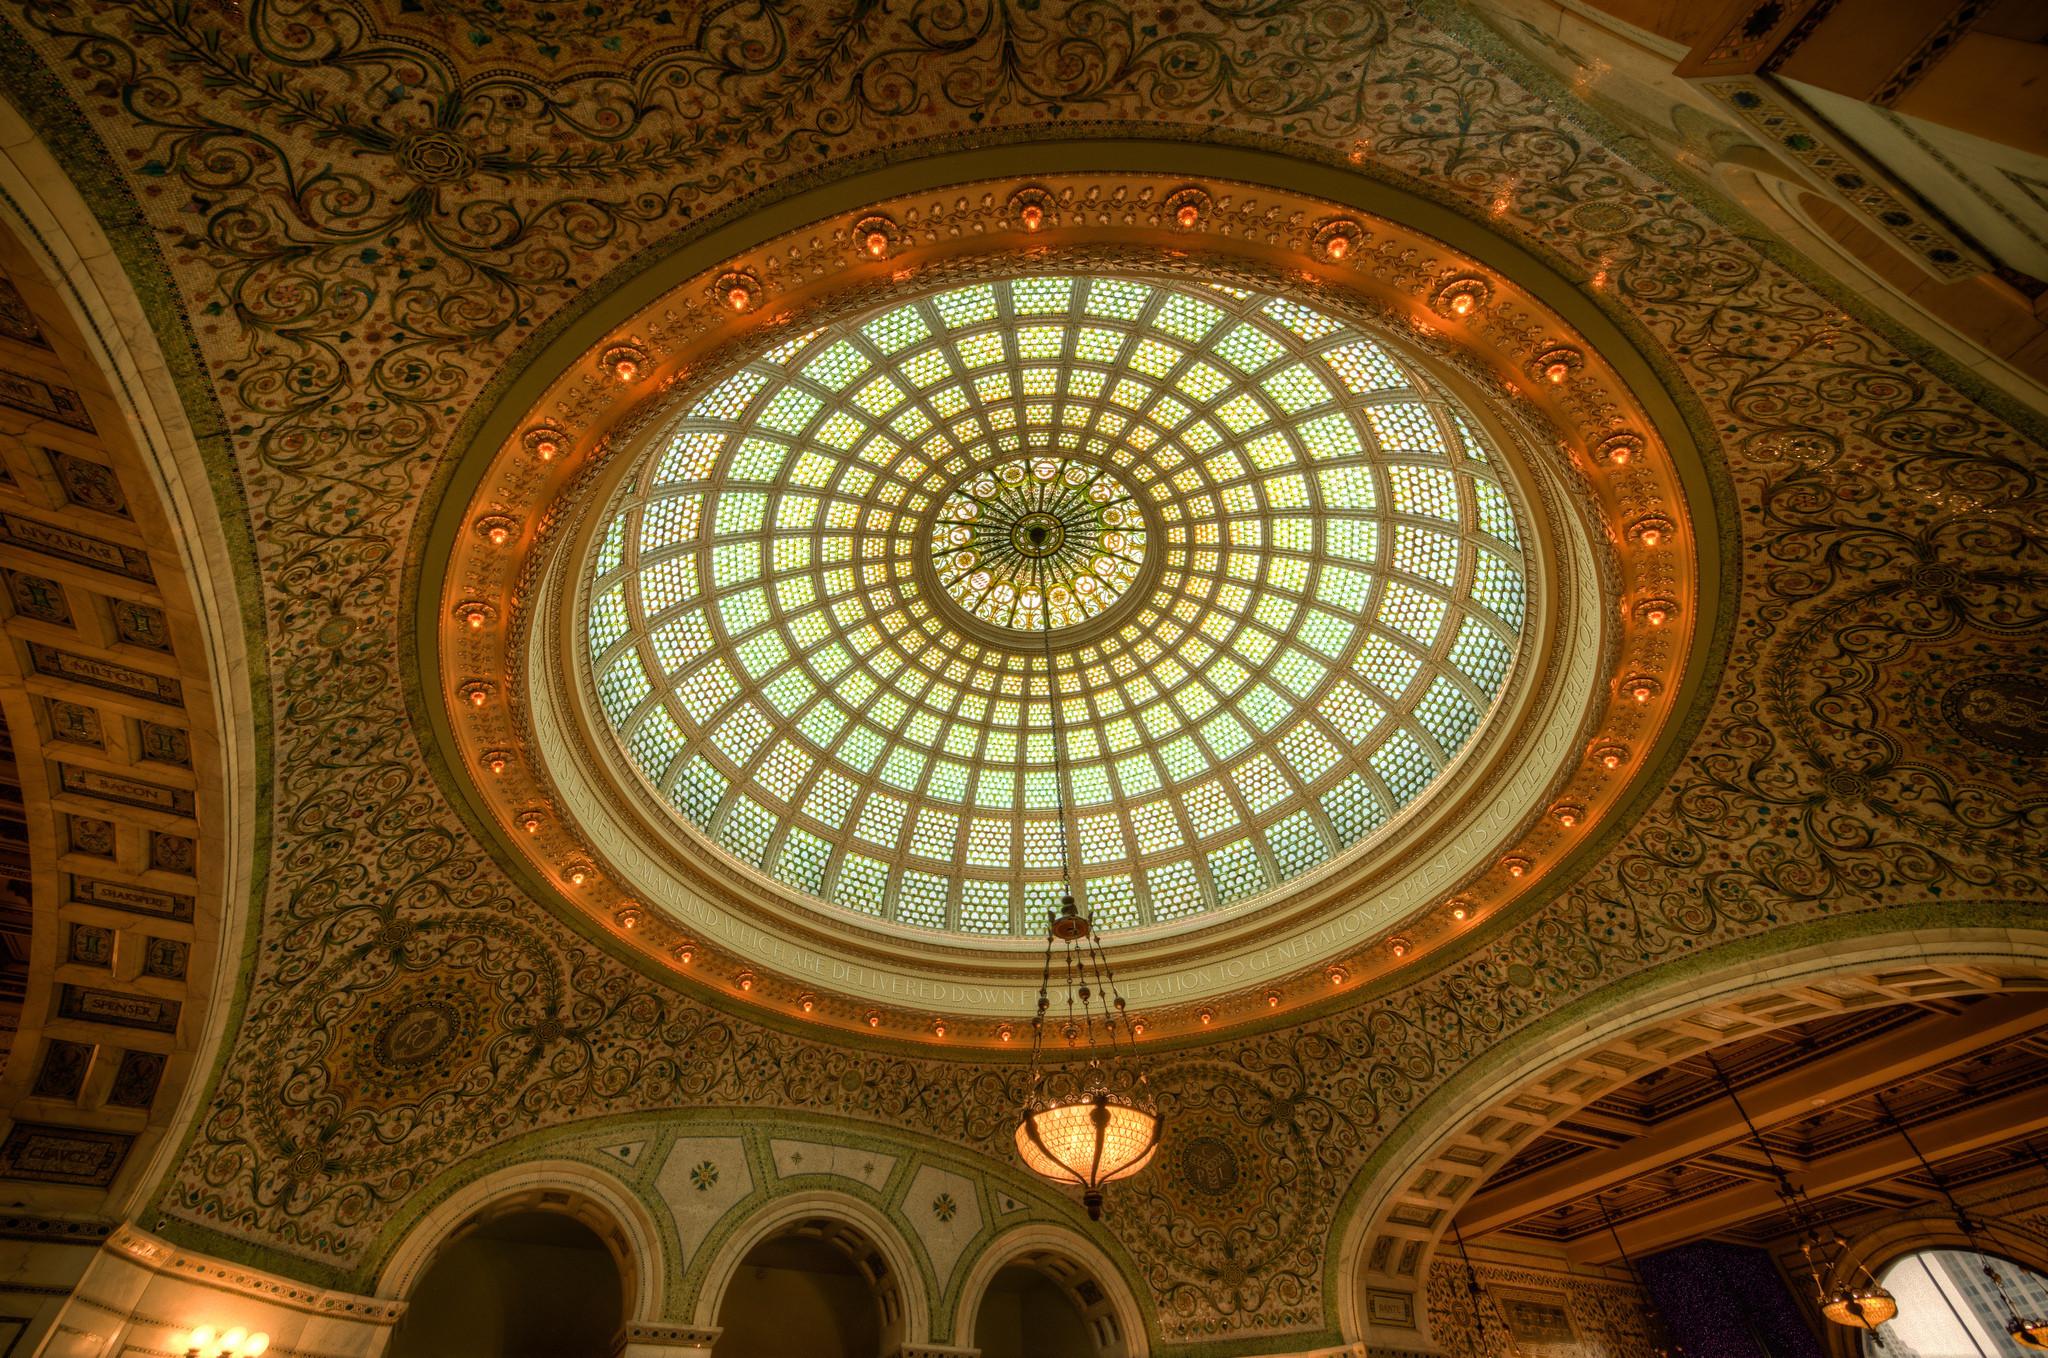 Quando a beleza está no teto, a regra é só uma: Deixar-se deslumbrar